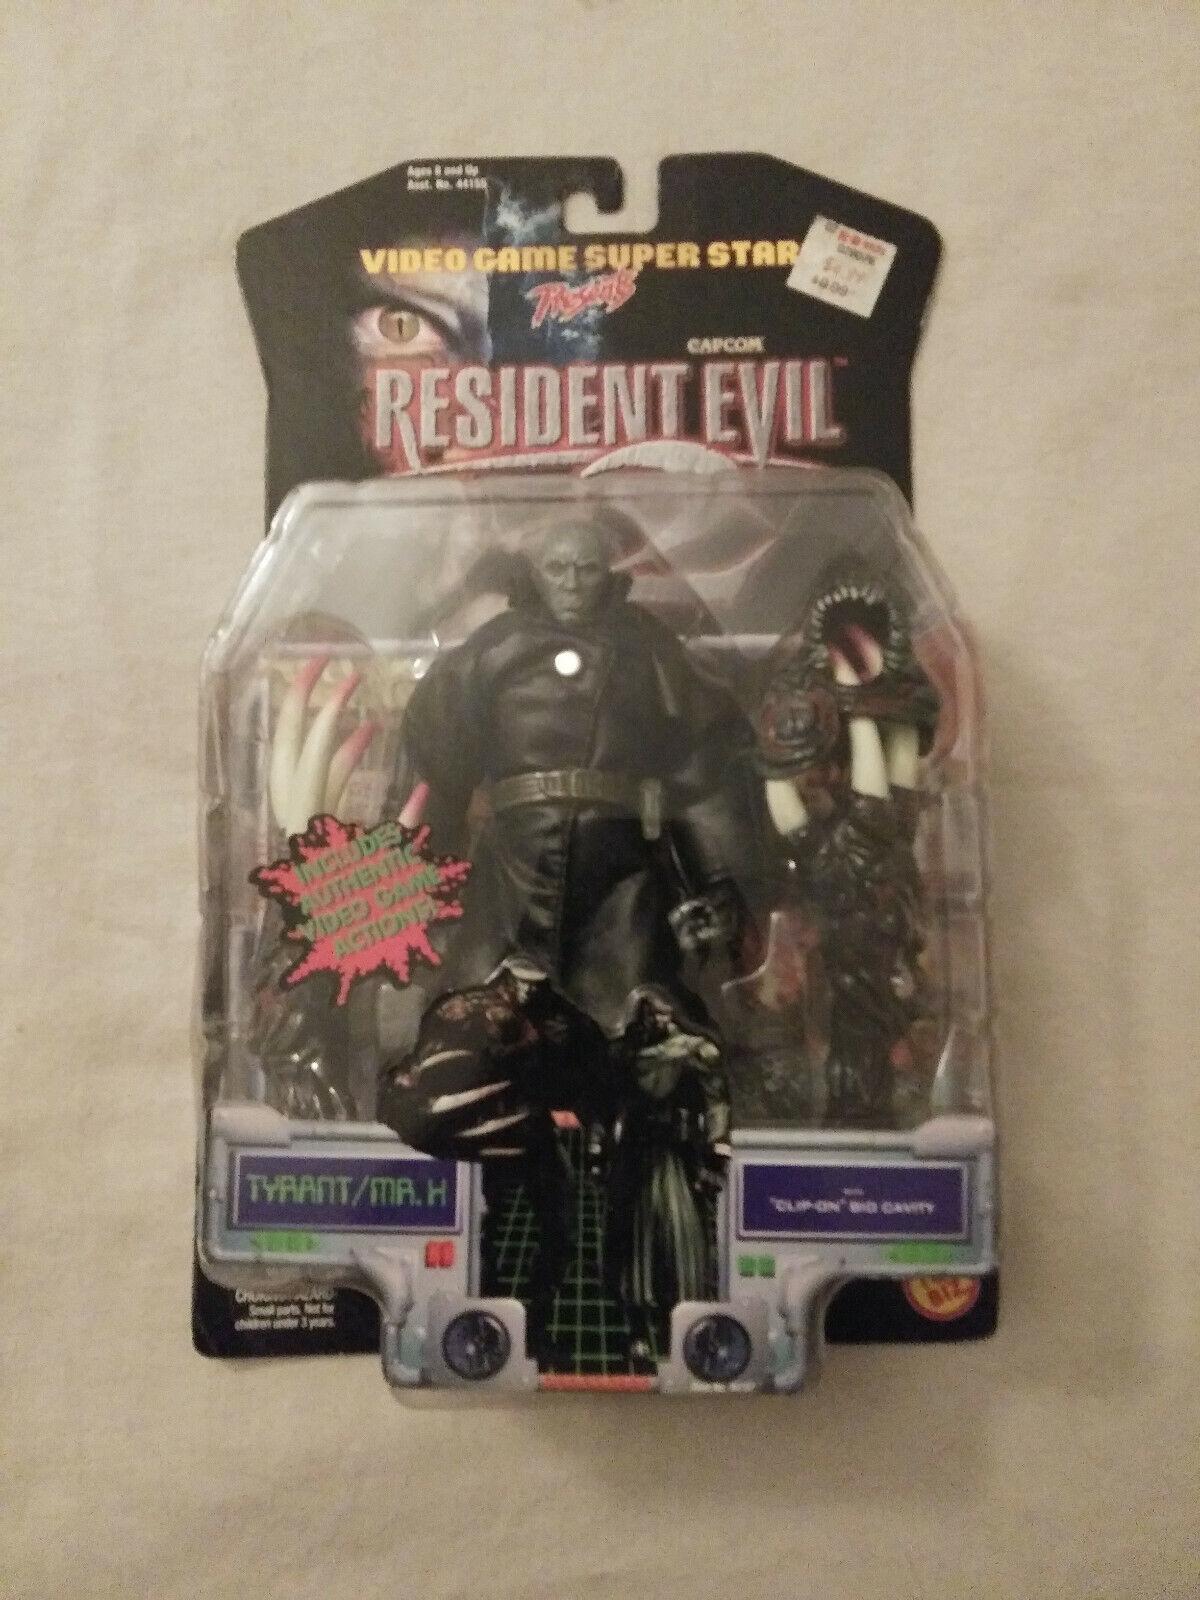 Mr. X Tyrant - Resident Evil 2 2 2 Action Figure (Video Game Superstars, 1998) 563395